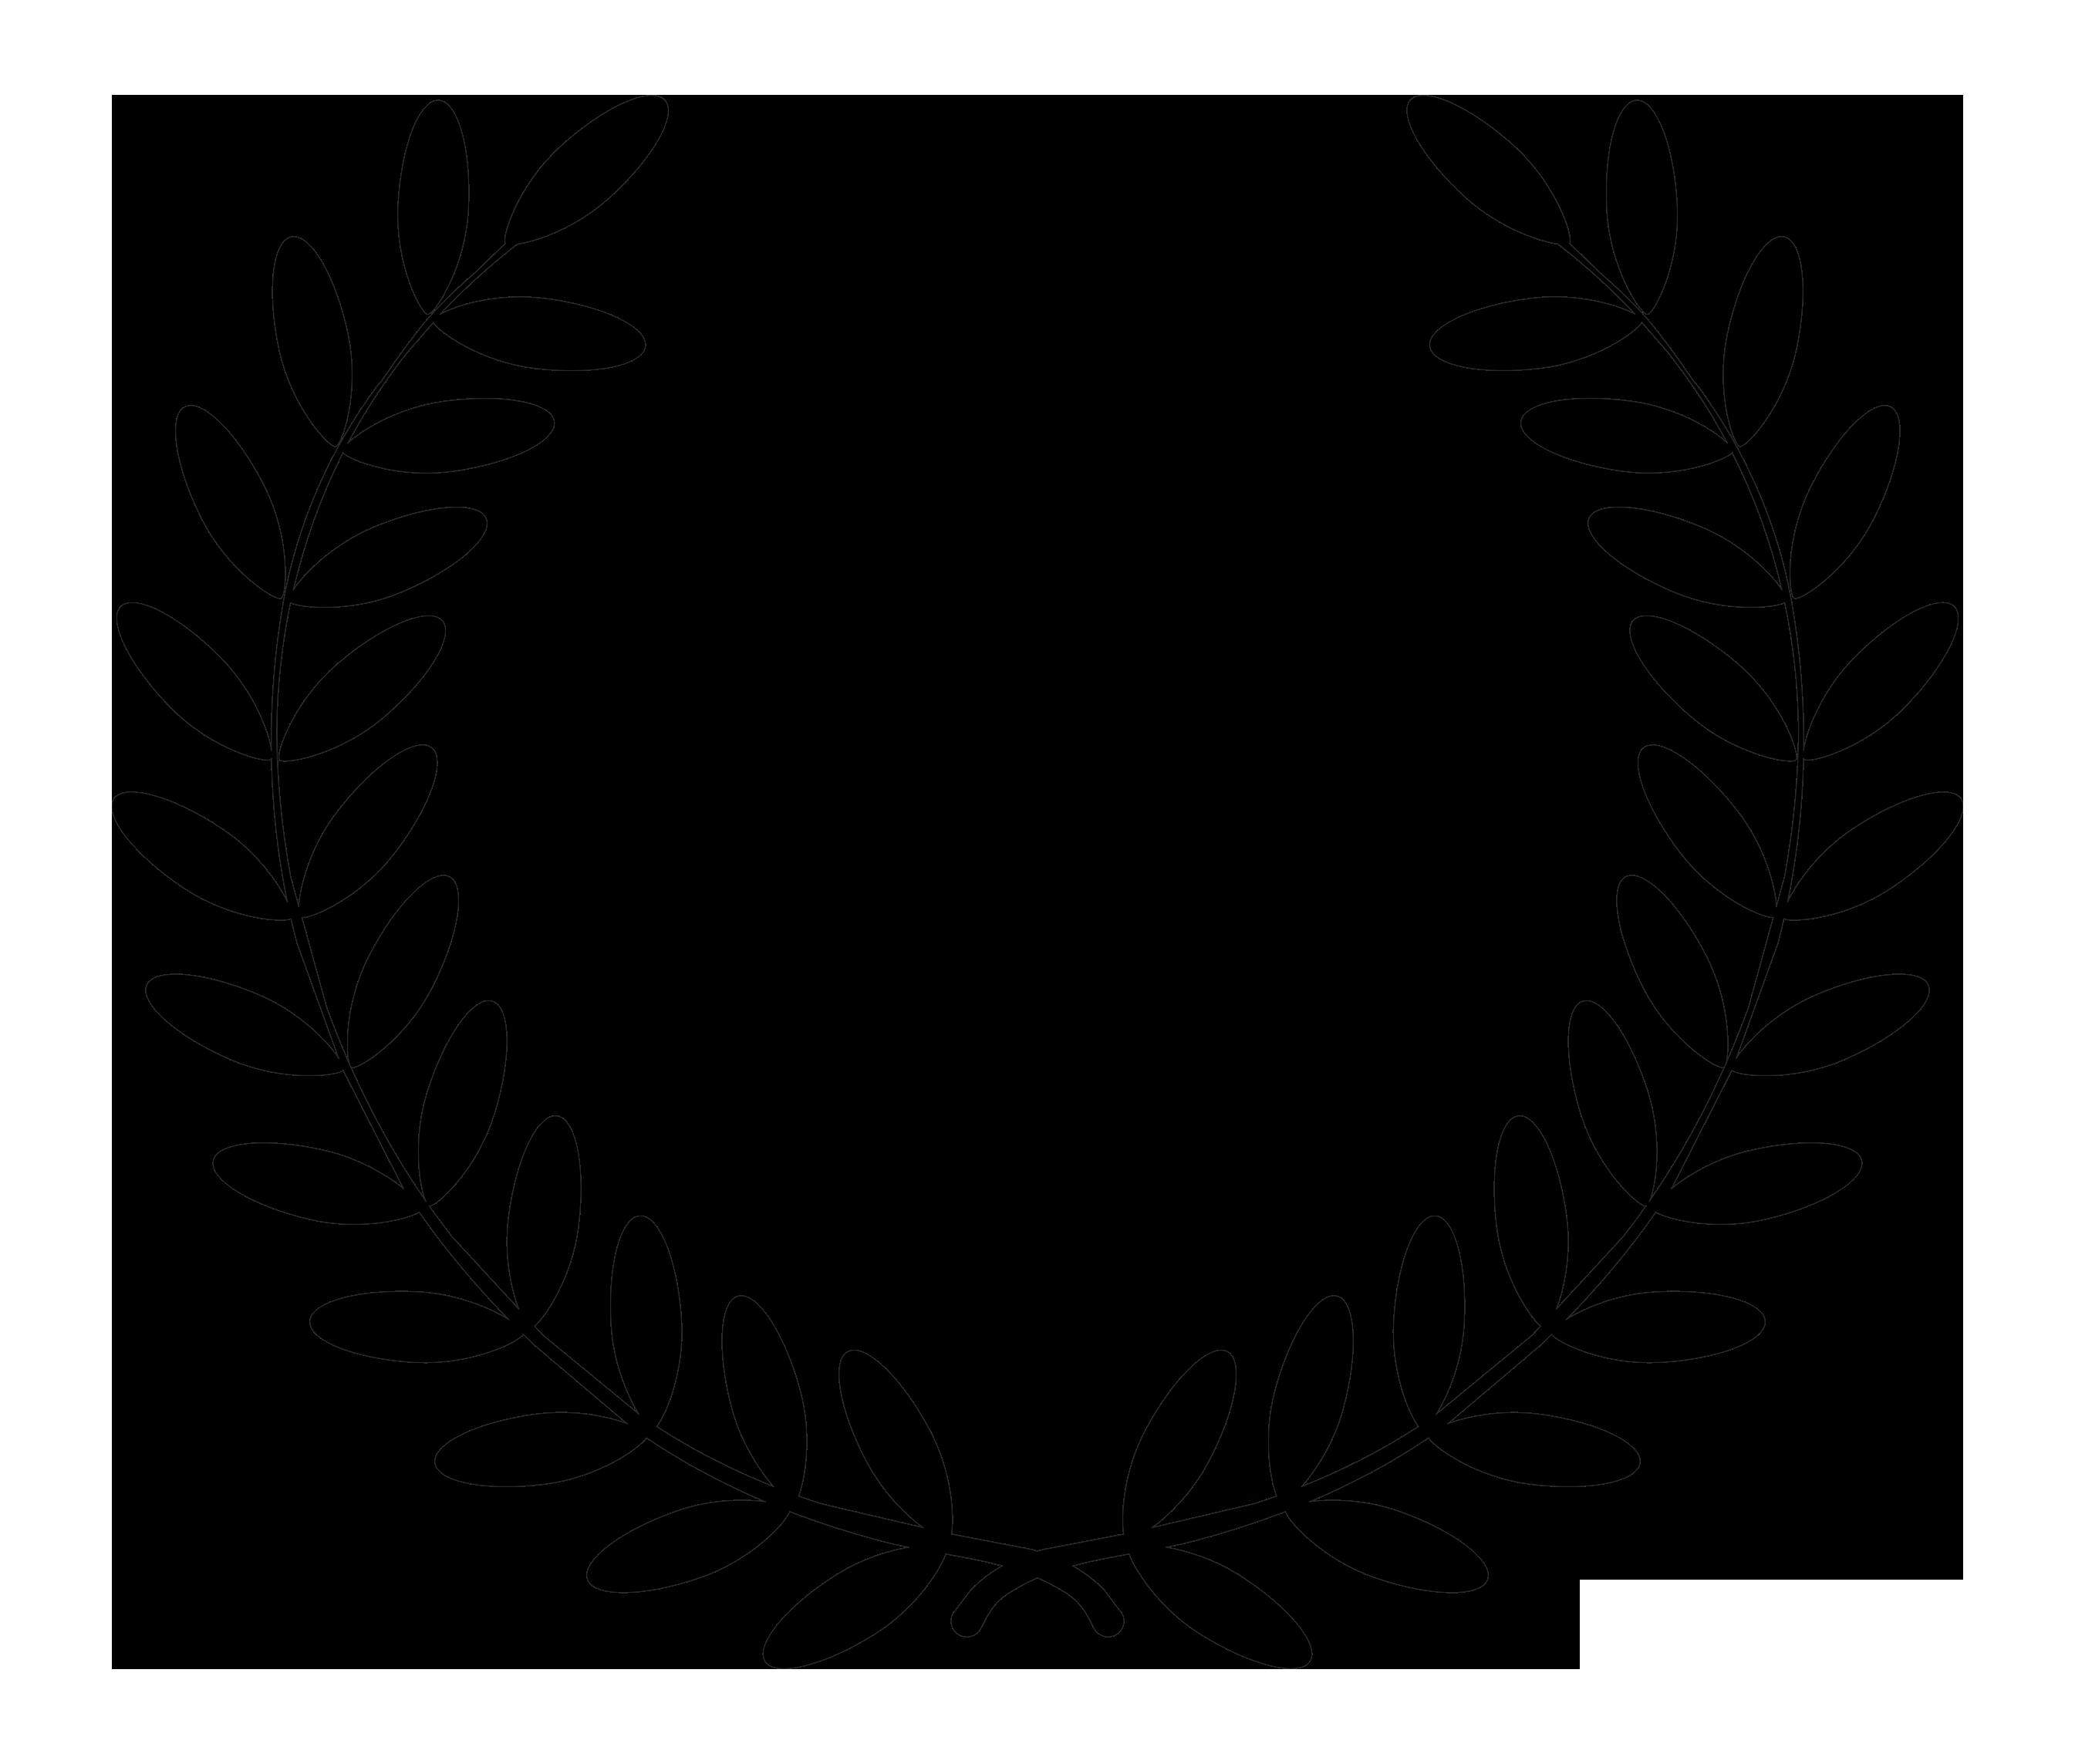 Fern clipart service award. Leaf wreath free download